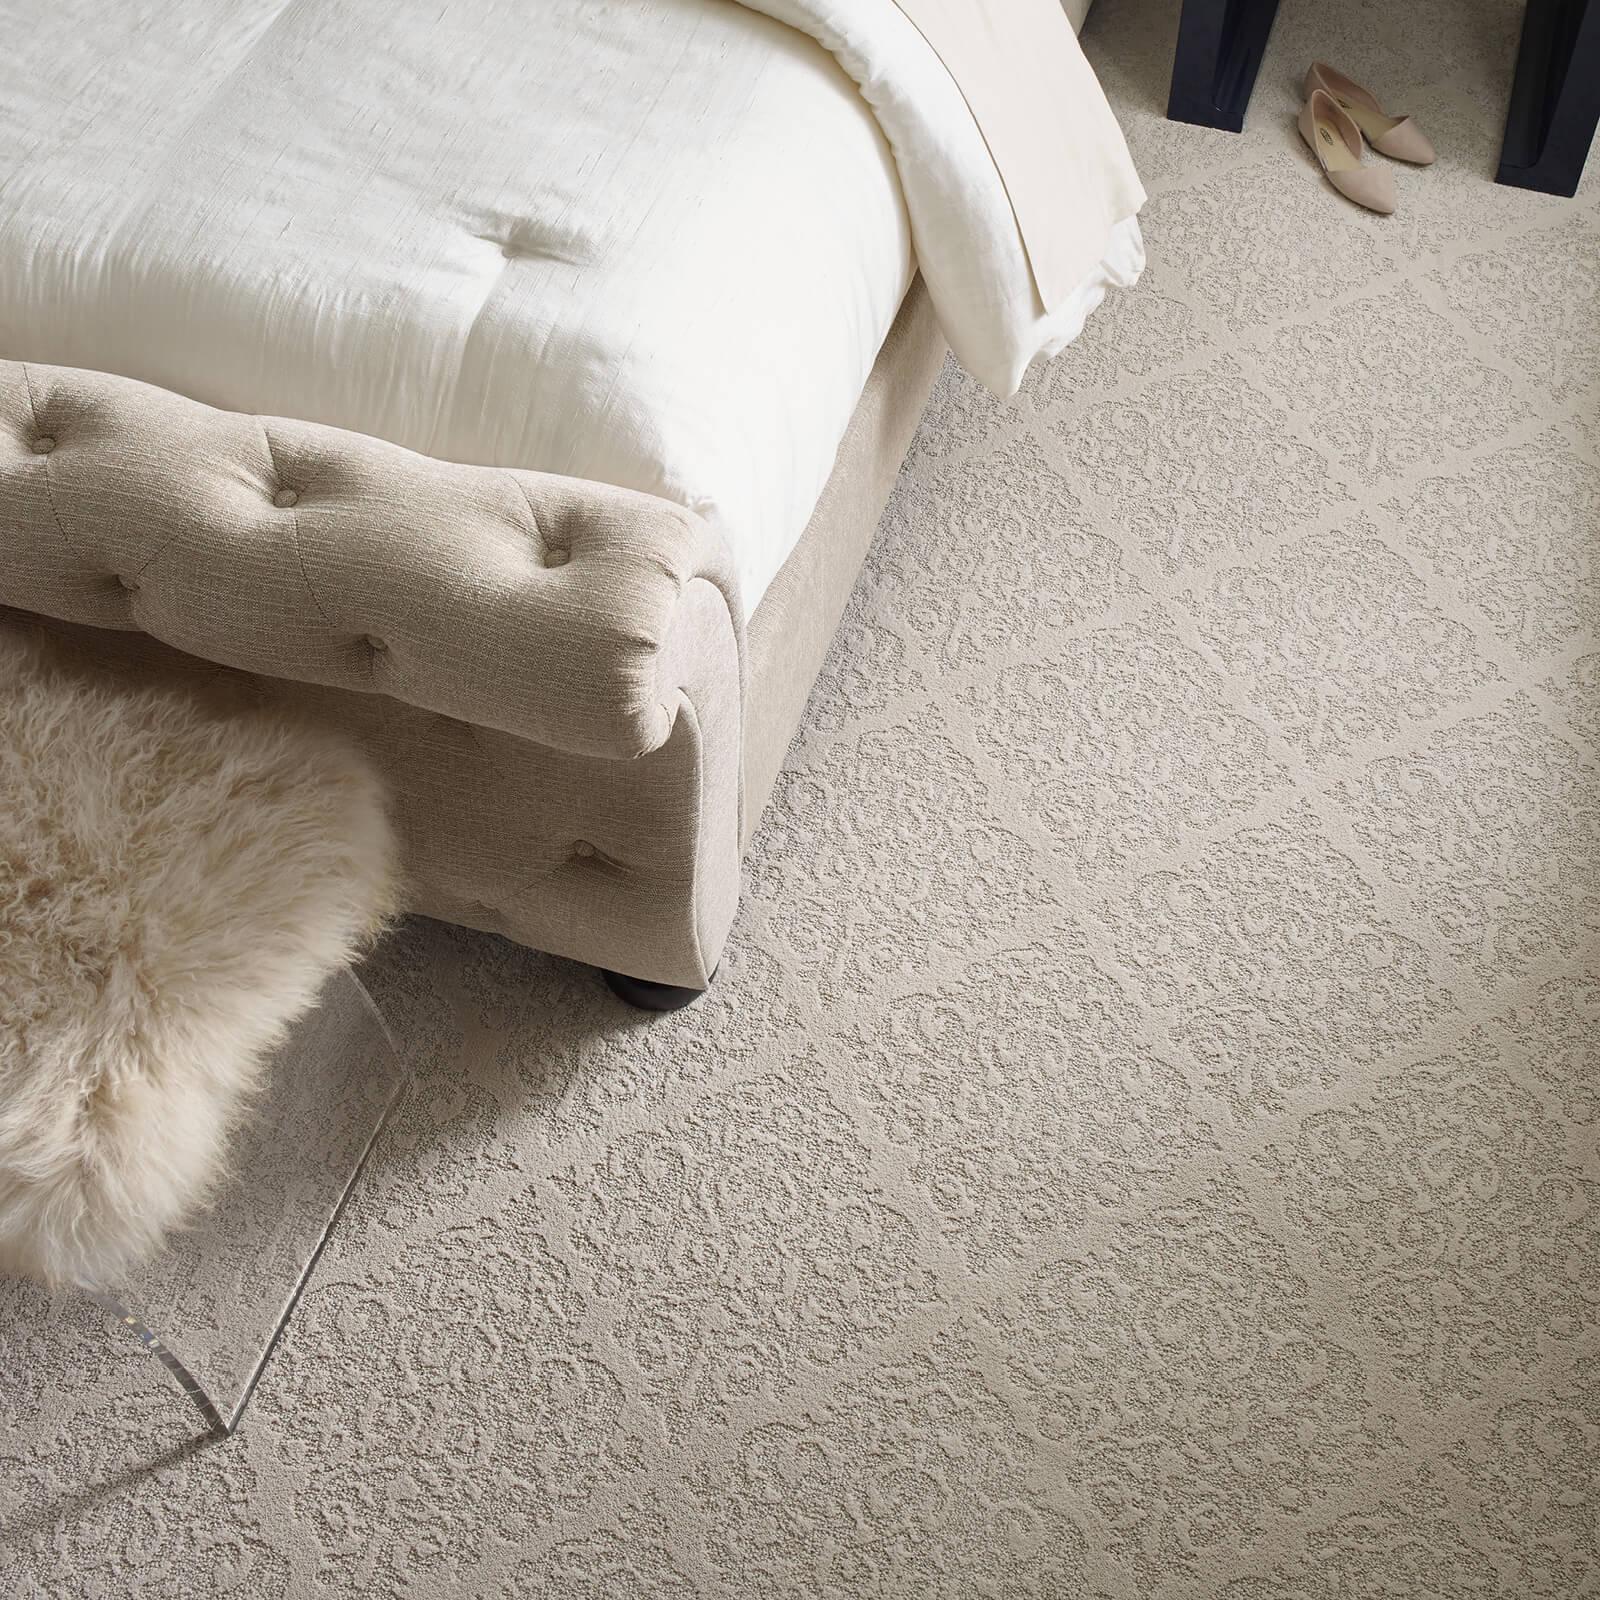 Chateau fare carpet | We'll Floor You